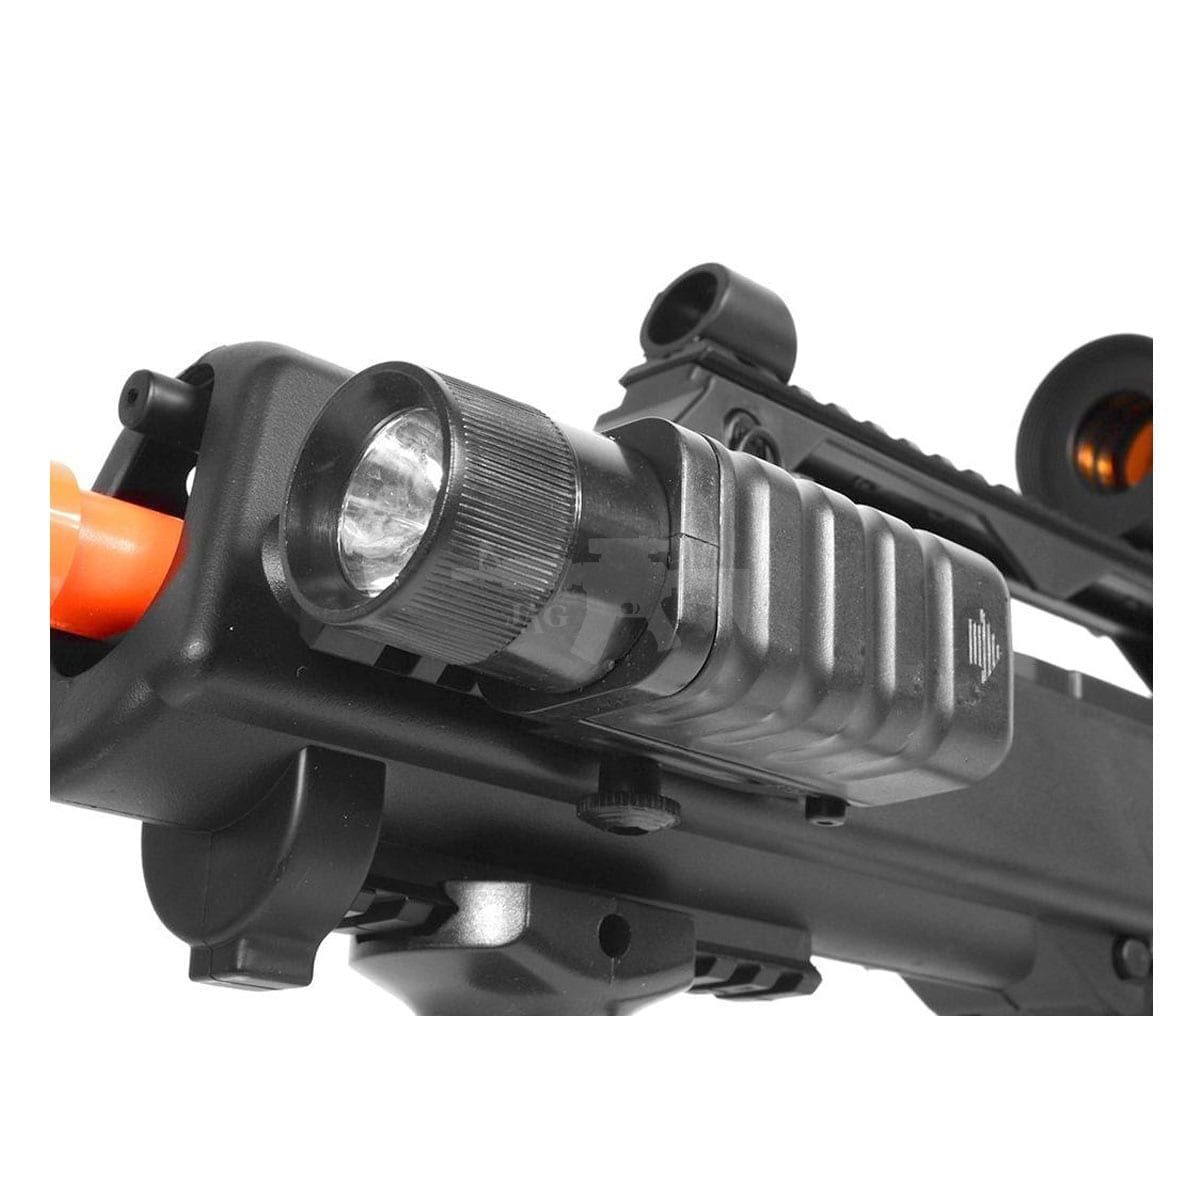 M85P DOUBLE EAGLE AIRSOFT ELECTRIC RIFLE GUN